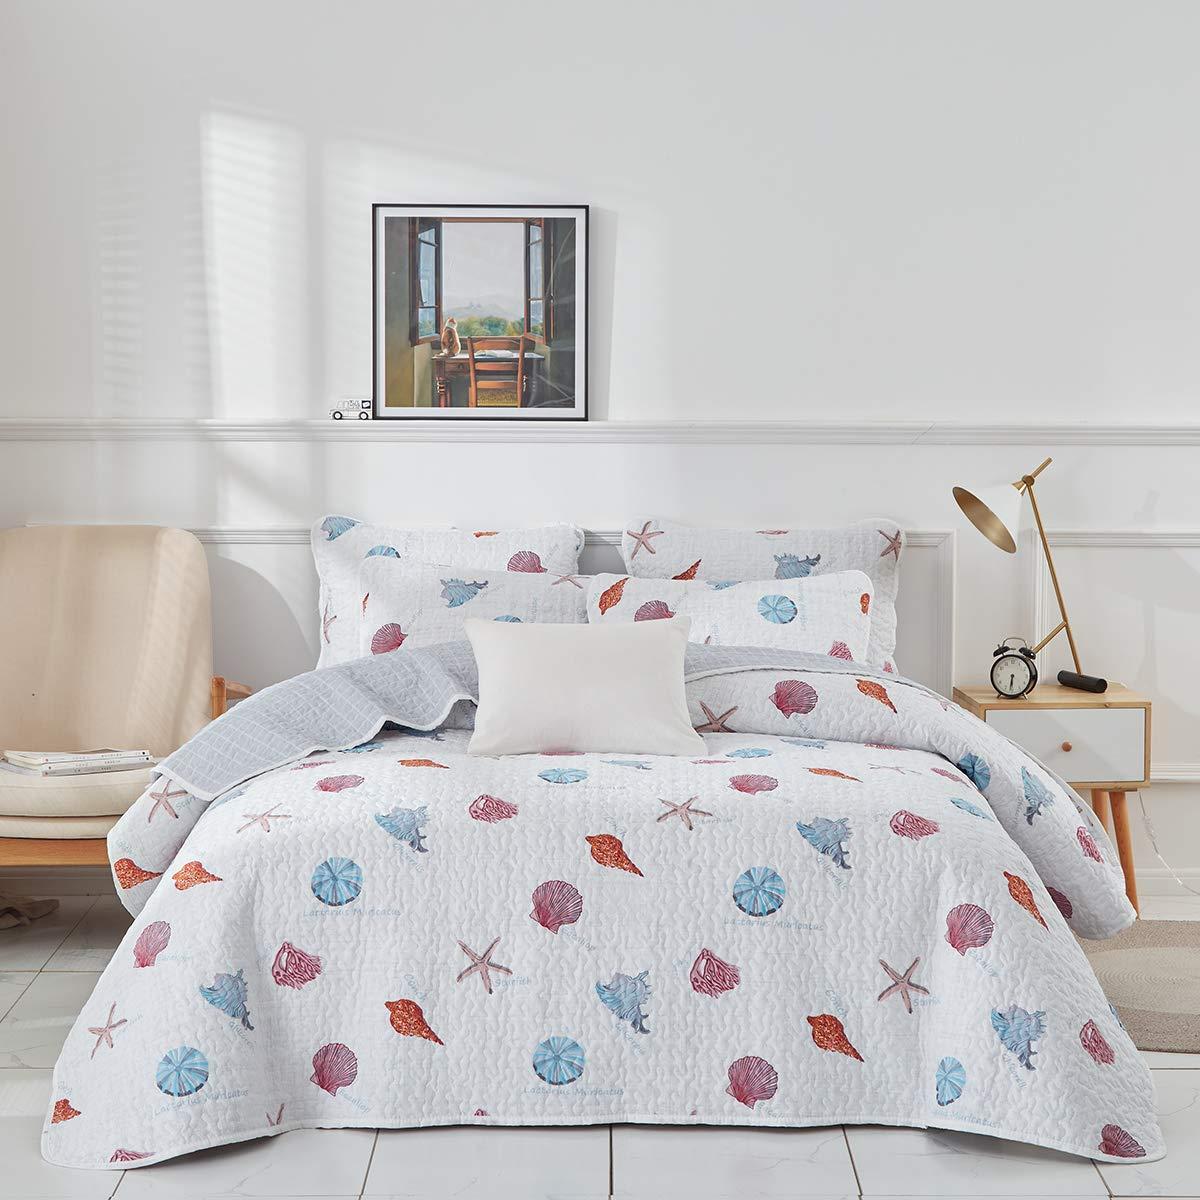 Uozzi Bedding 3 Piece Reversible Gray Ocean Quilt Set King Size 104x90 Soft Microfiber Lightweight Summer Coverlet with Conch Starfish callop (1 Quilt + 2 Shams)